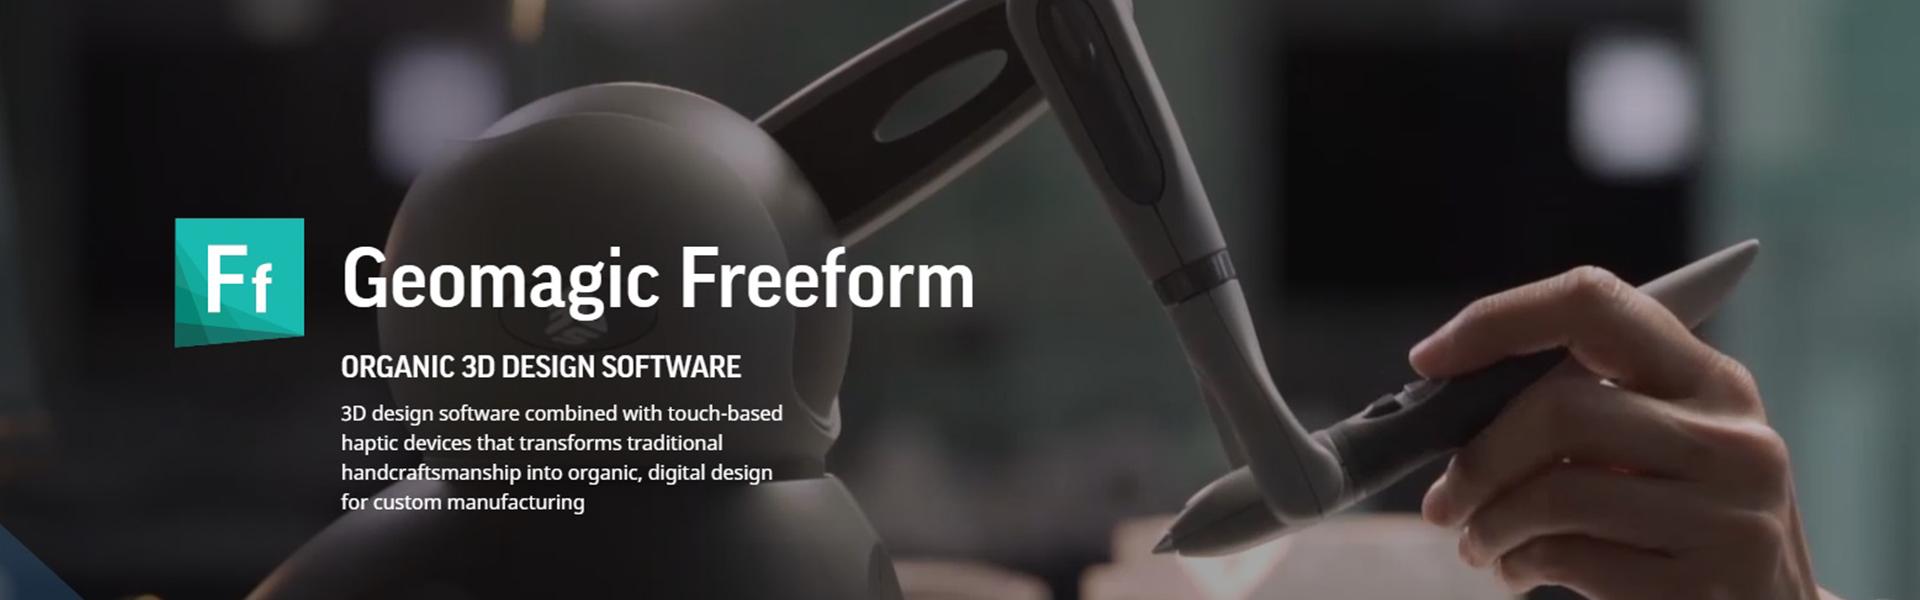 Geomagic Freeform software